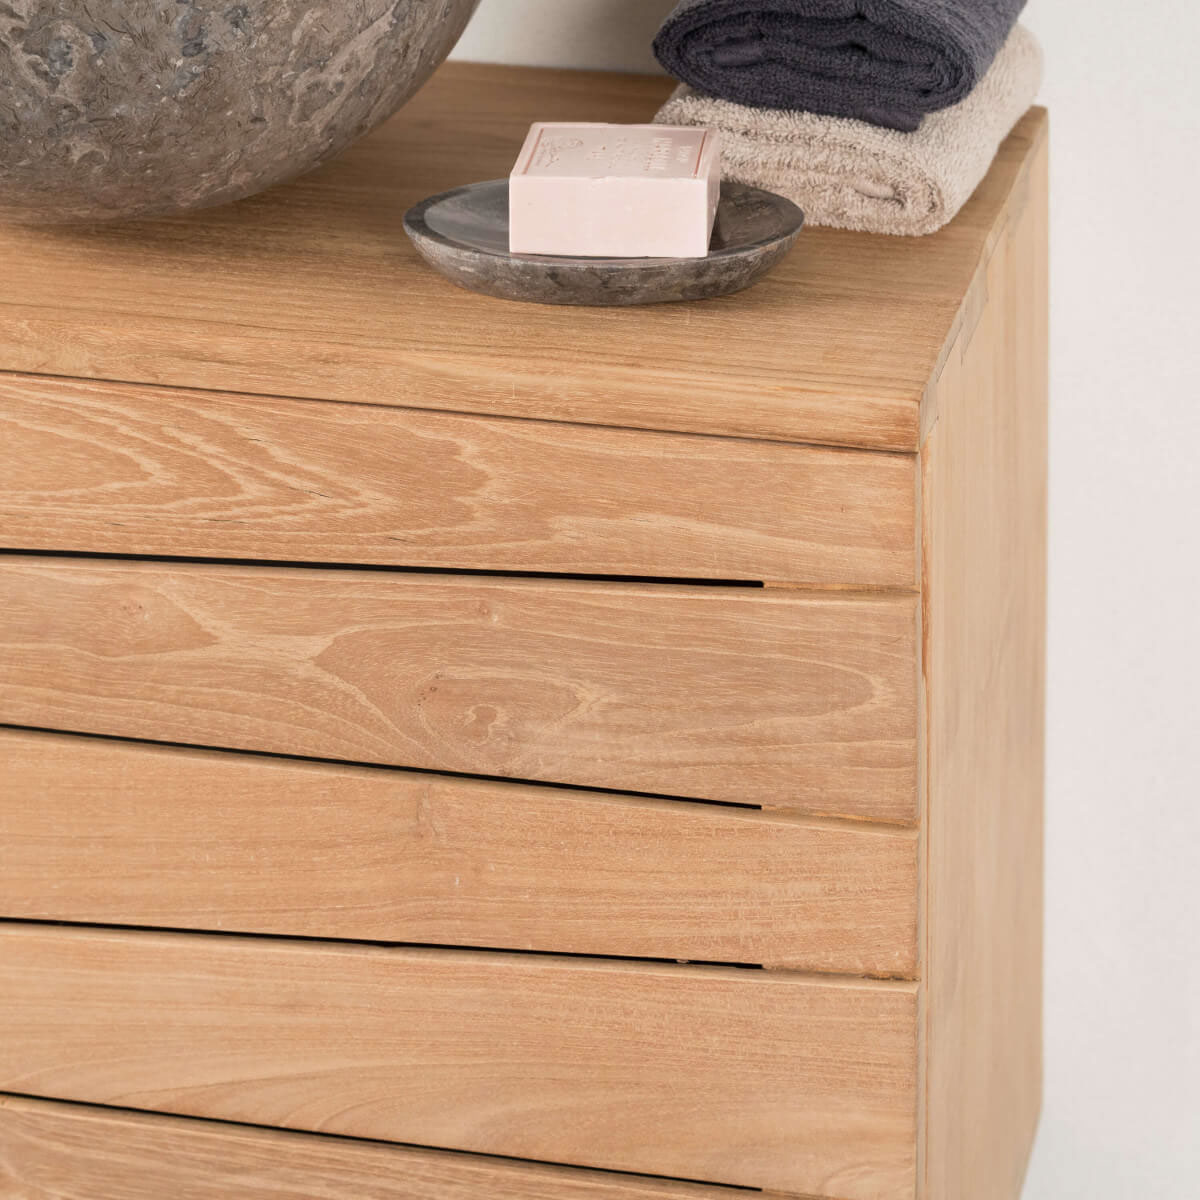 Neuf meuble de salle de bain suspendu cosy 50x30 cm ebay - Ebay meuble salle de bain ...